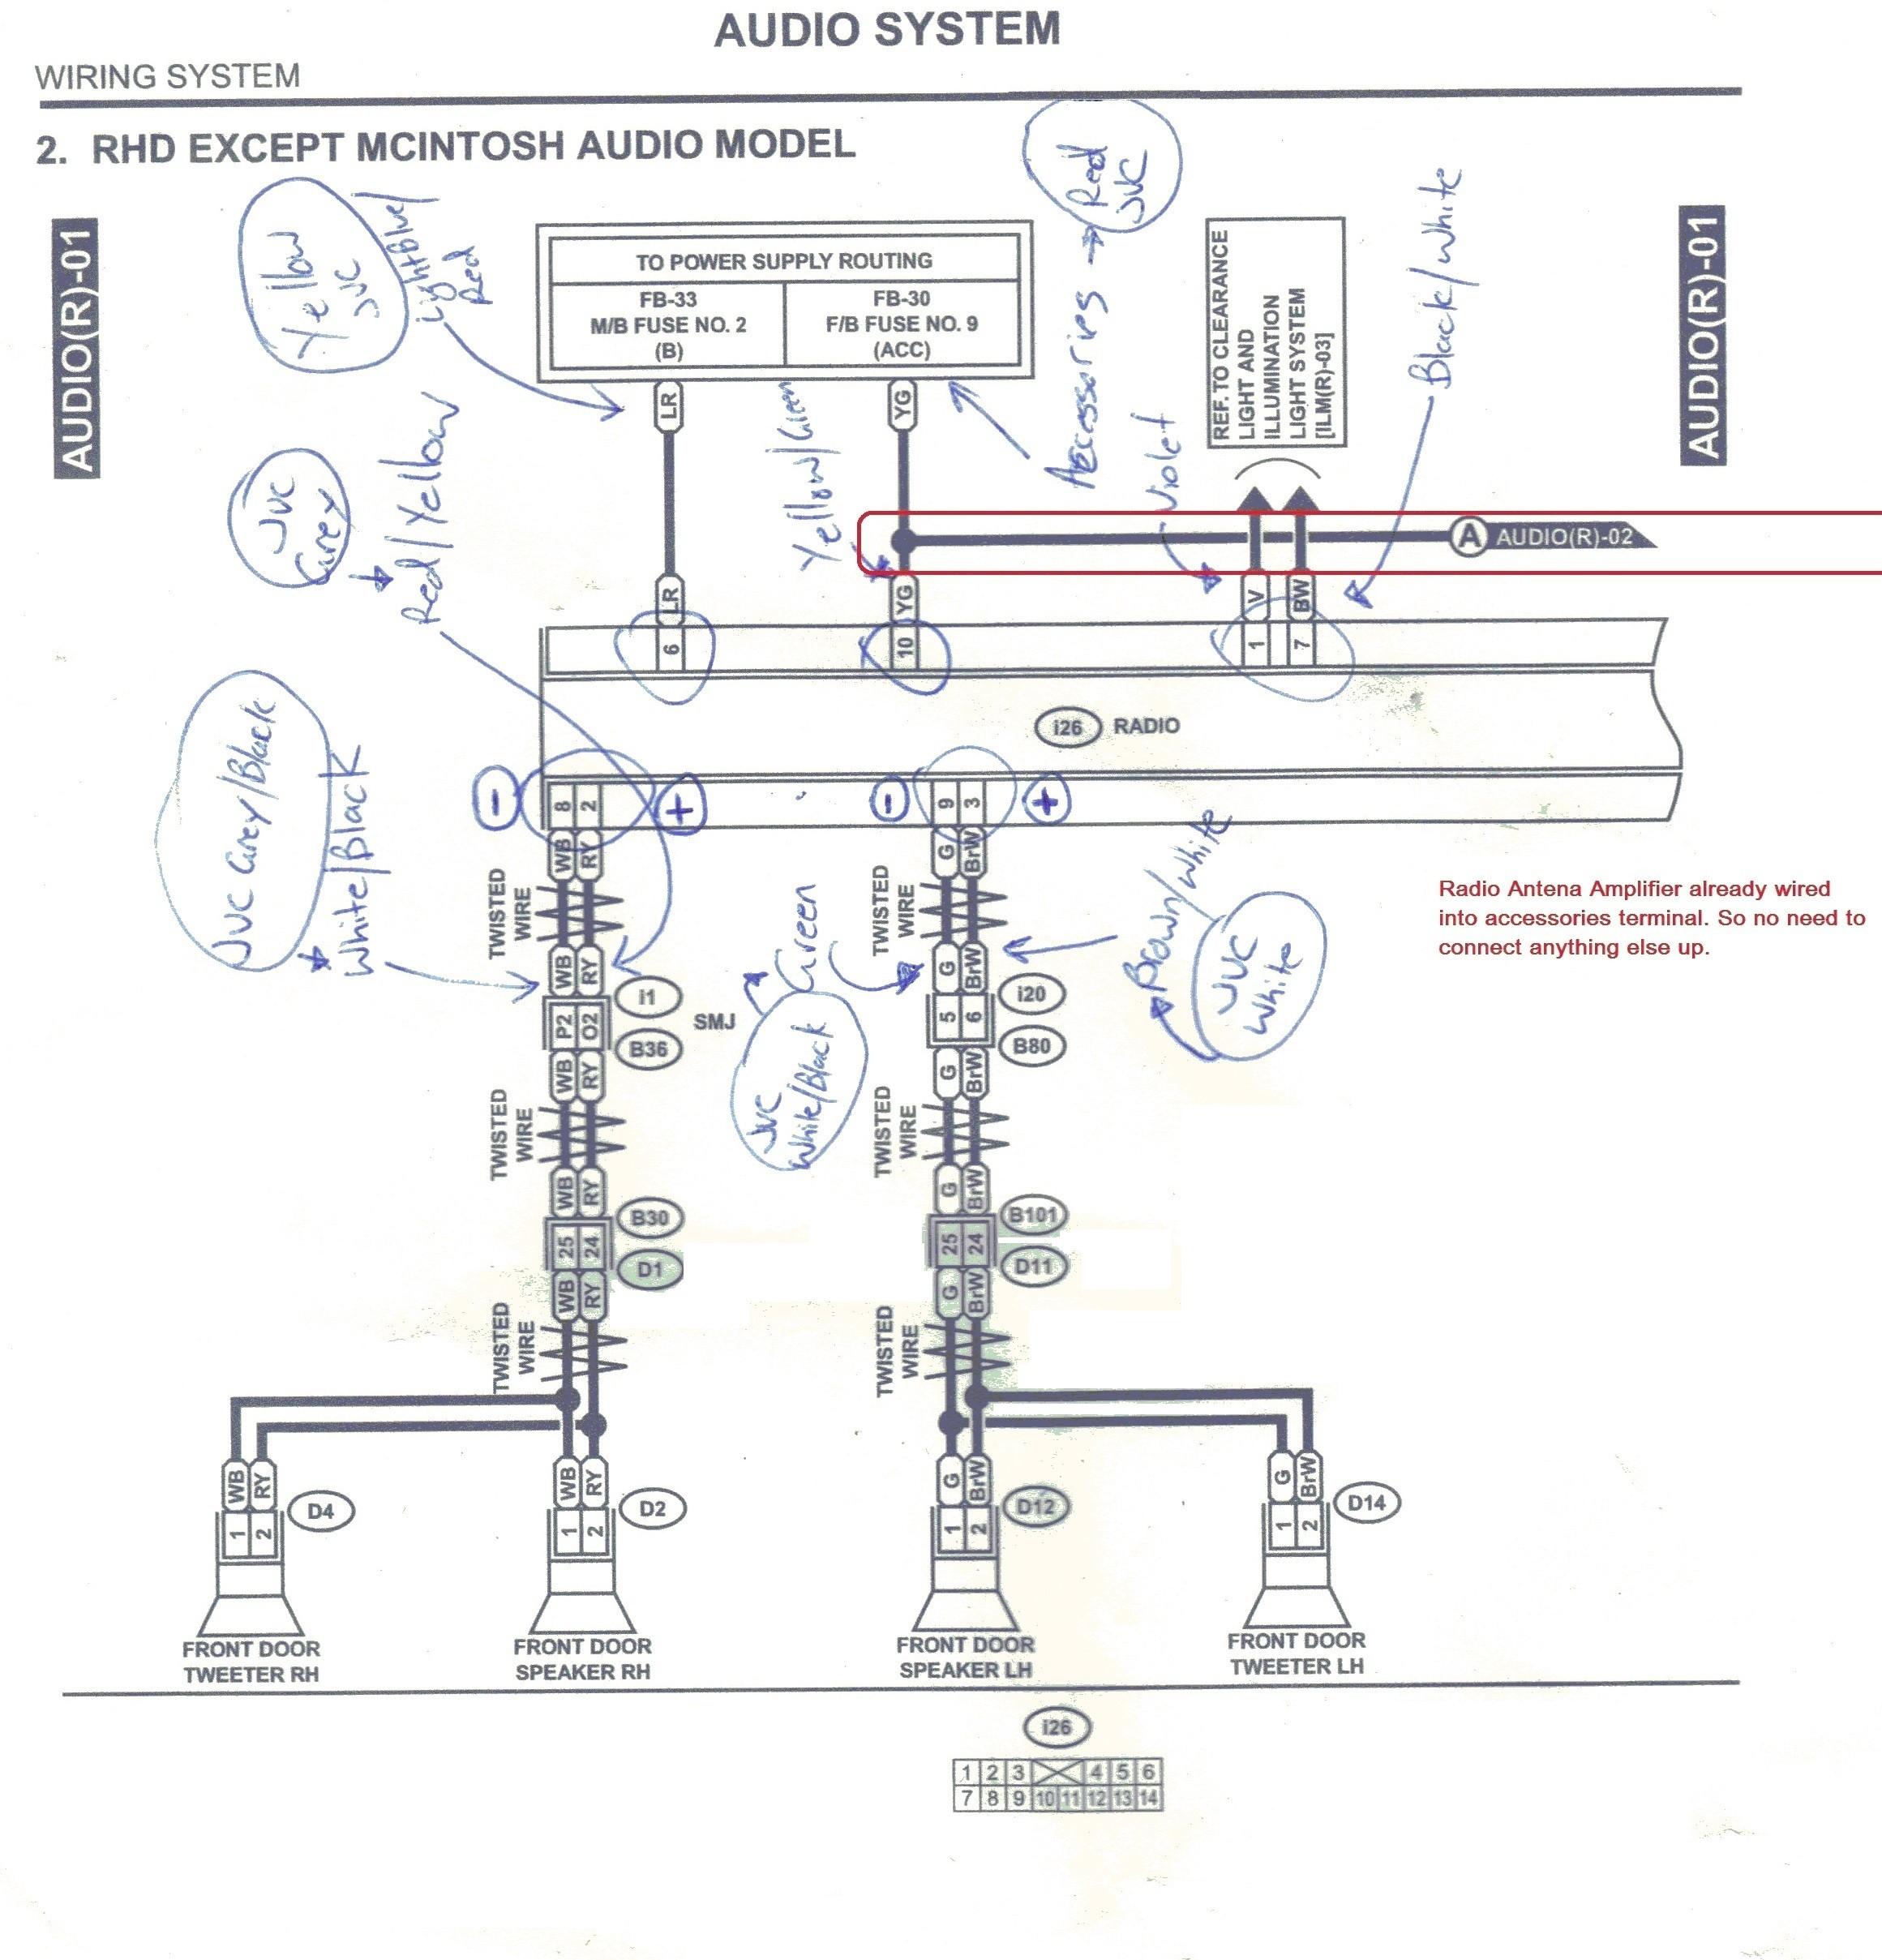 1999 subaru outback engine diagram as well 98 subaru forester engine rh  dasdes co